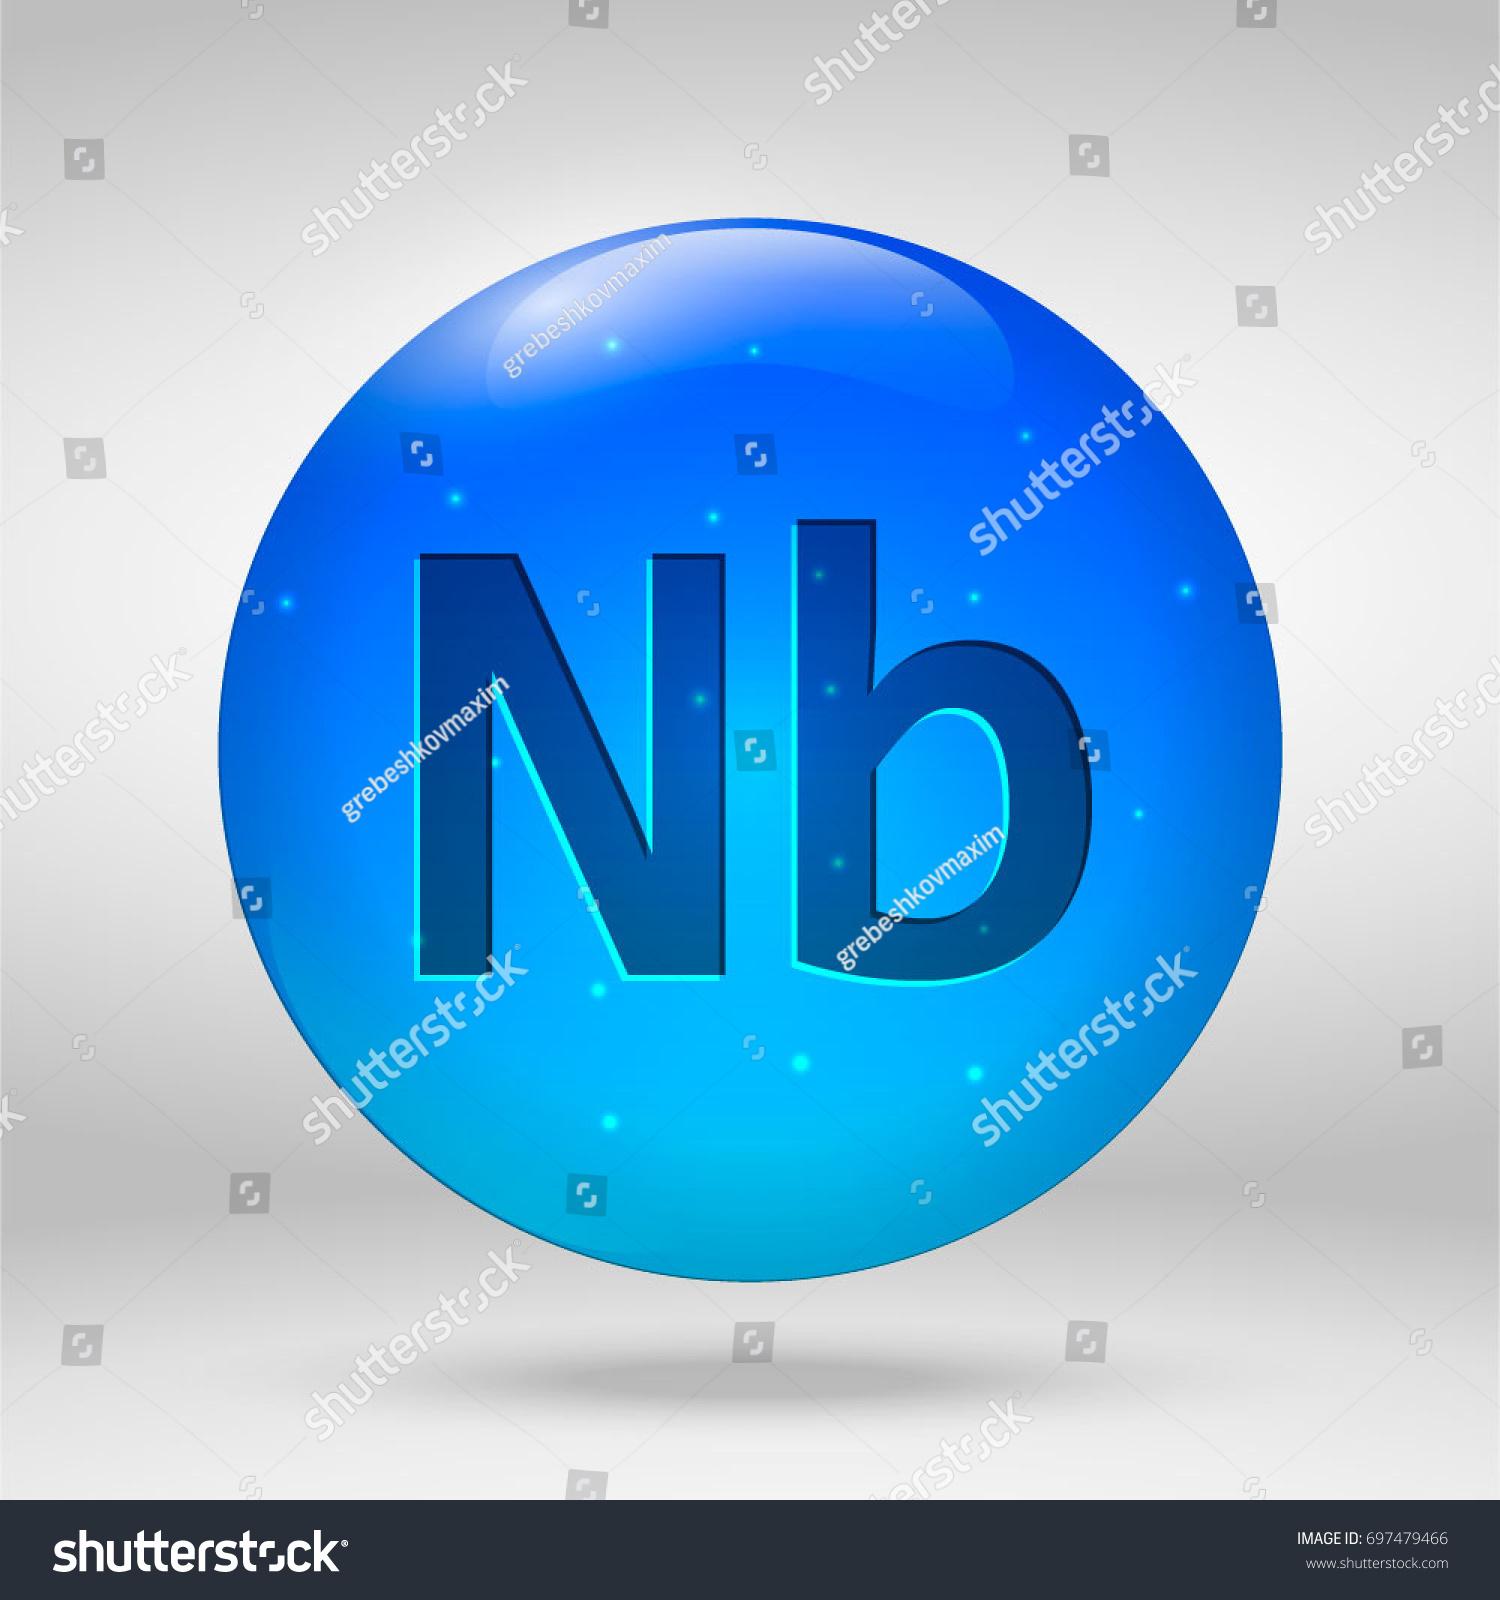 periodic table symbol d choice image periodic table and sample periodic table symbol breakdown image collections - Periodic Table Symbol Breakdown